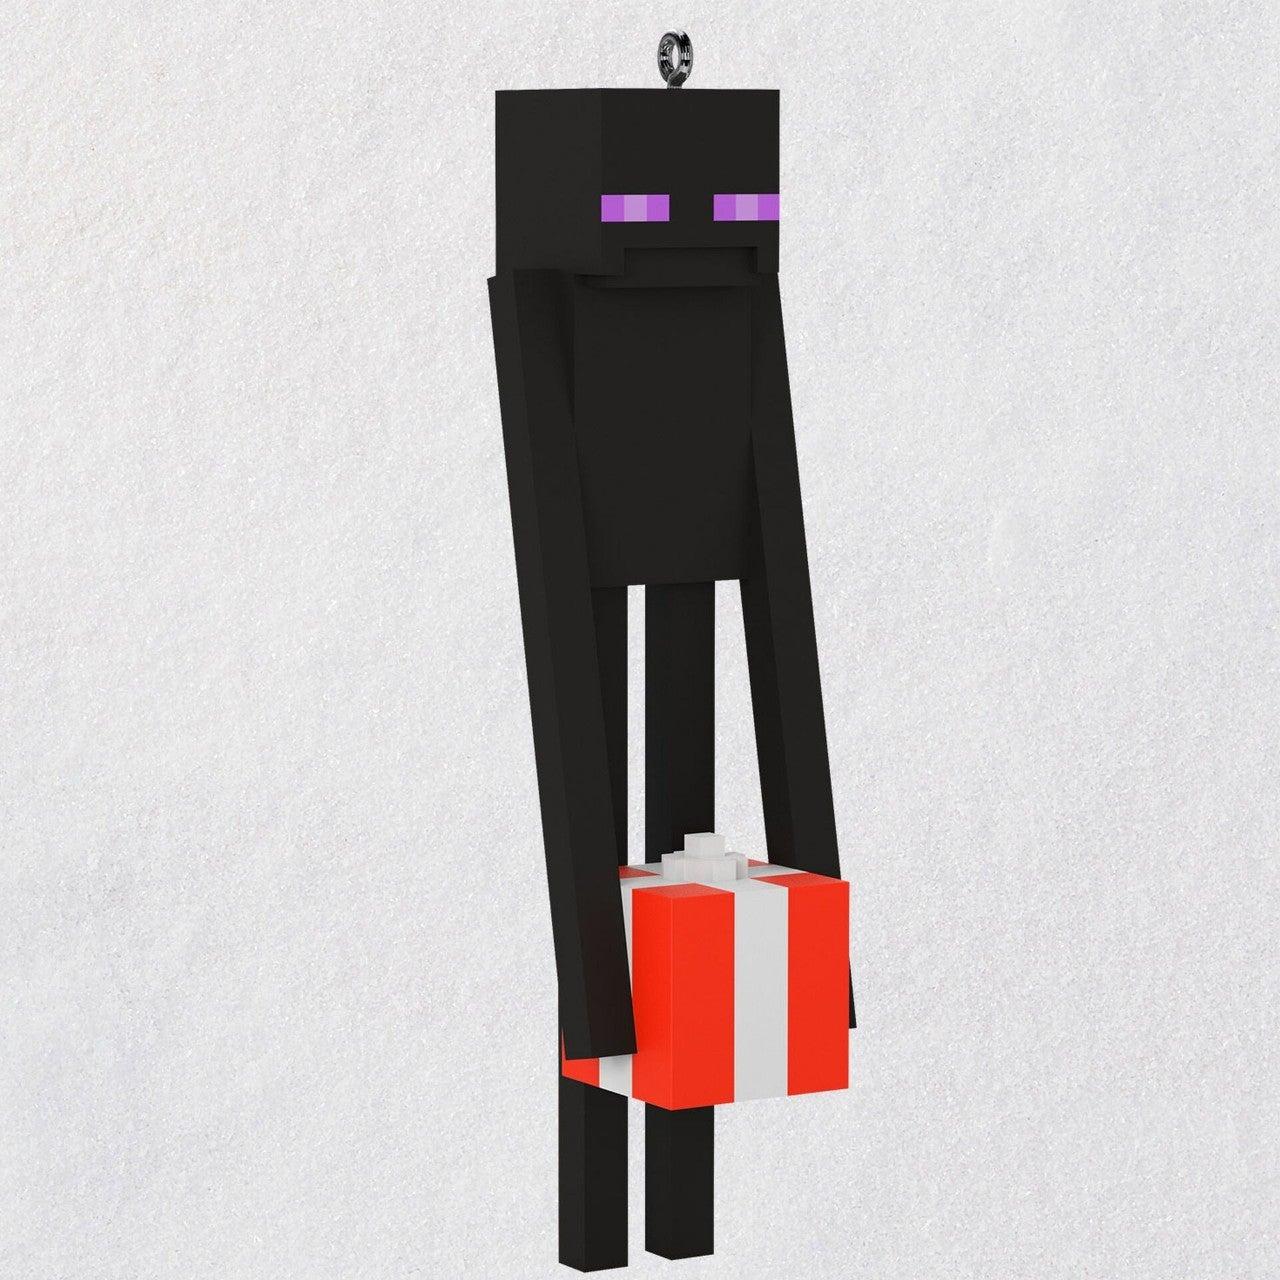 Minecraft-Enderman-Andenken-Ornament_1899QXI7435_01